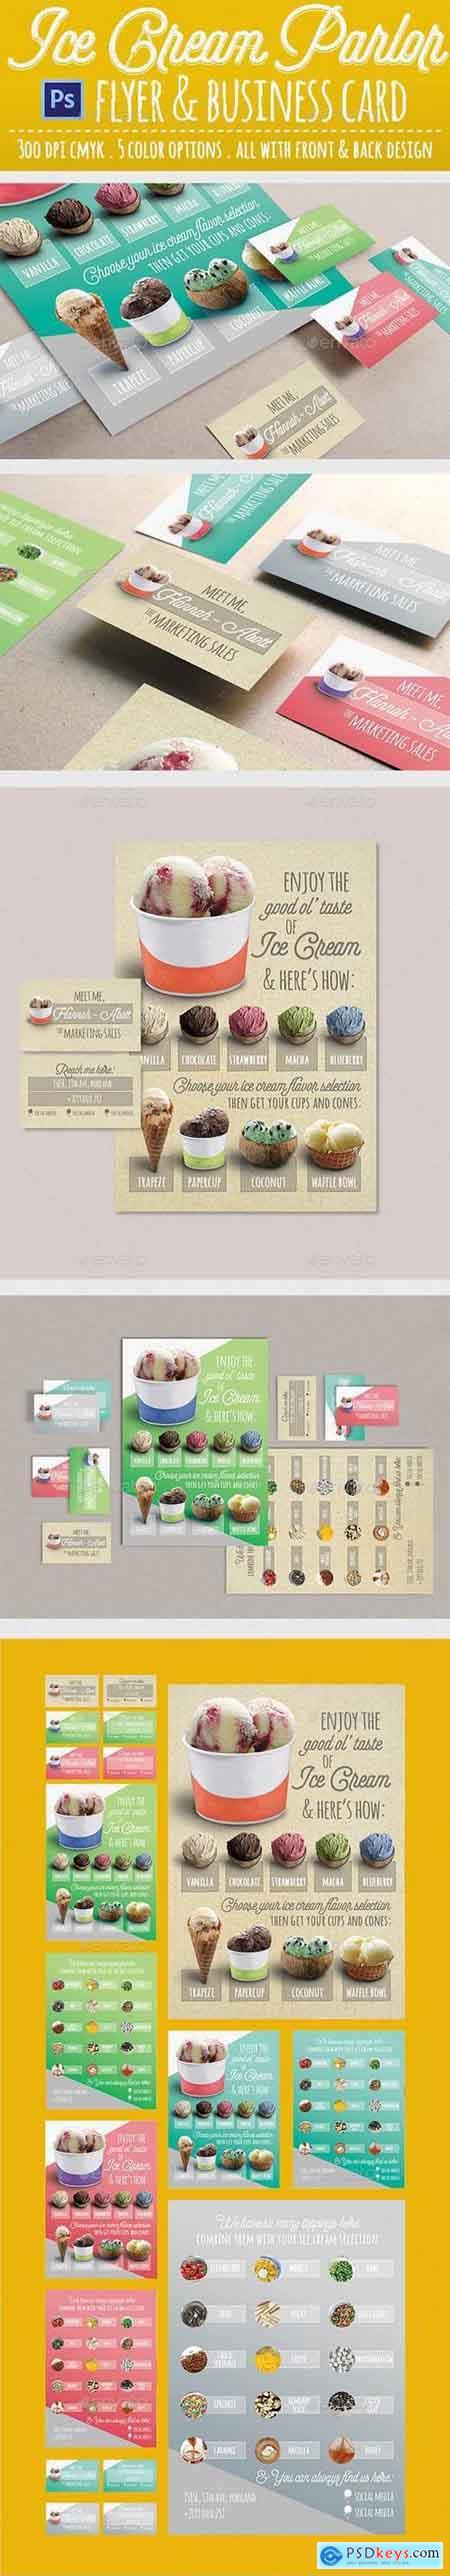 Graphicriver Modern Ice Cream Parlor Flyer